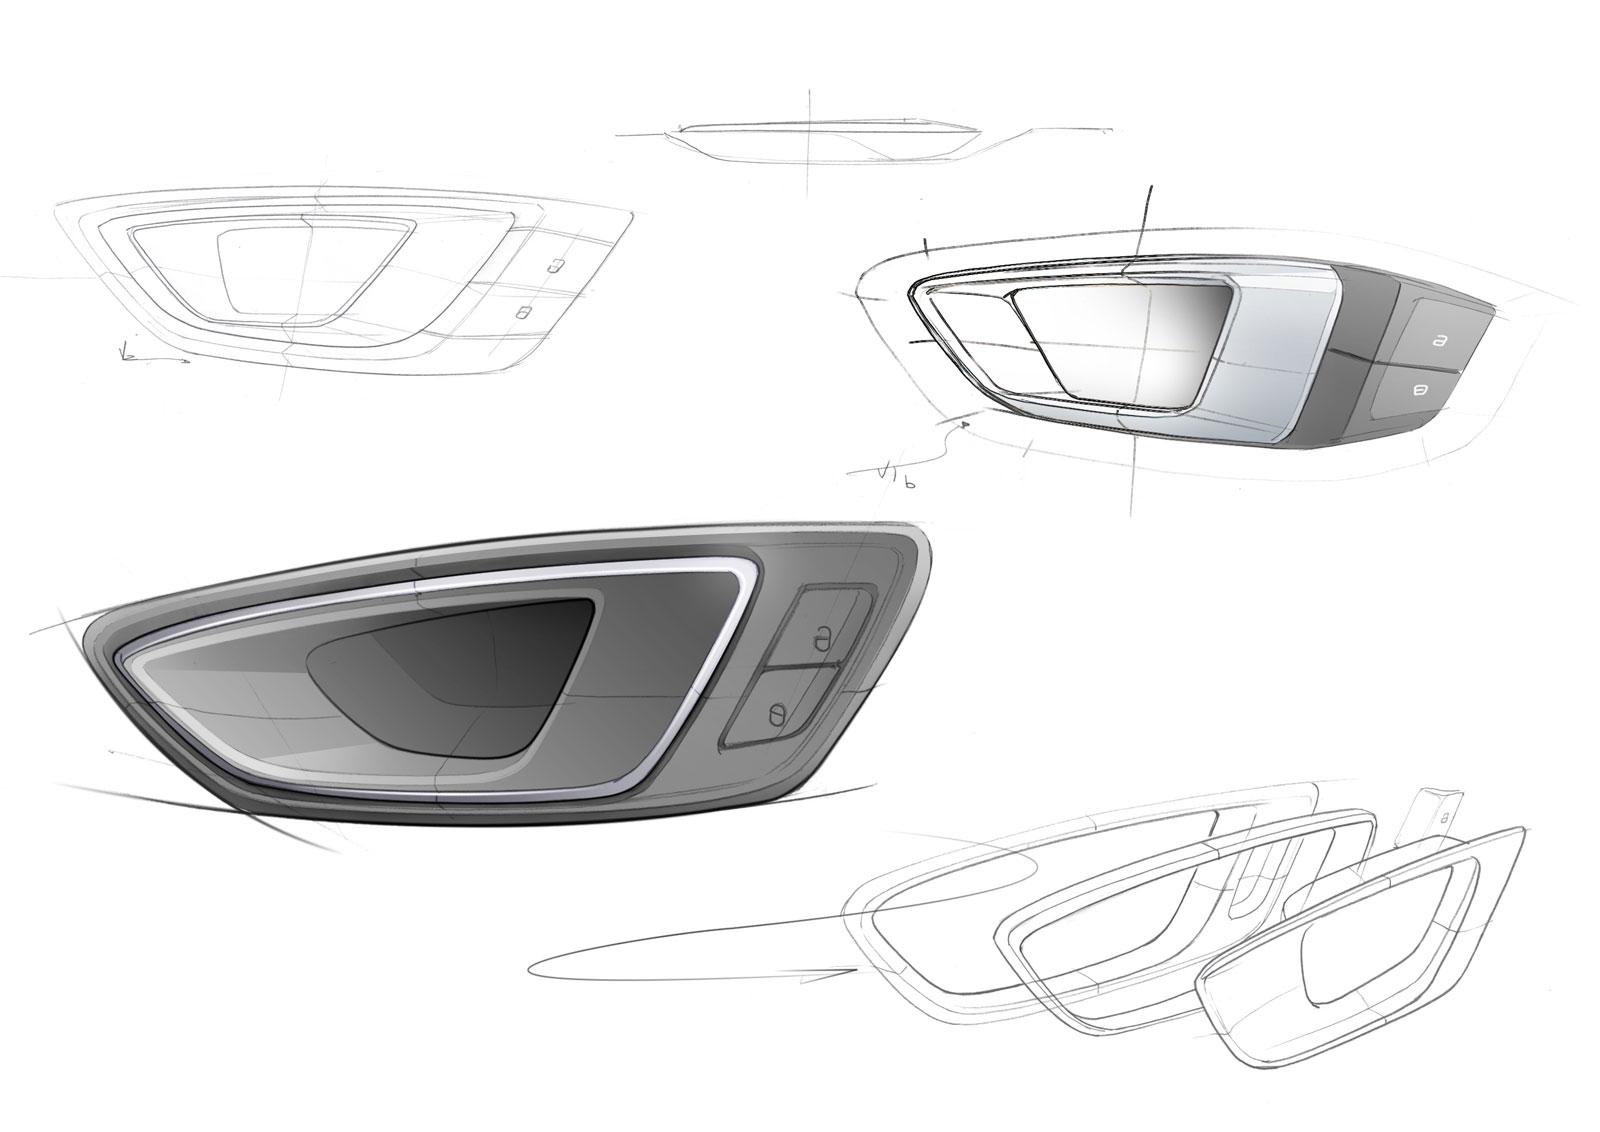 seat leon st interior door handle design sketches car body design. Black Bedroom Furniture Sets. Home Design Ideas